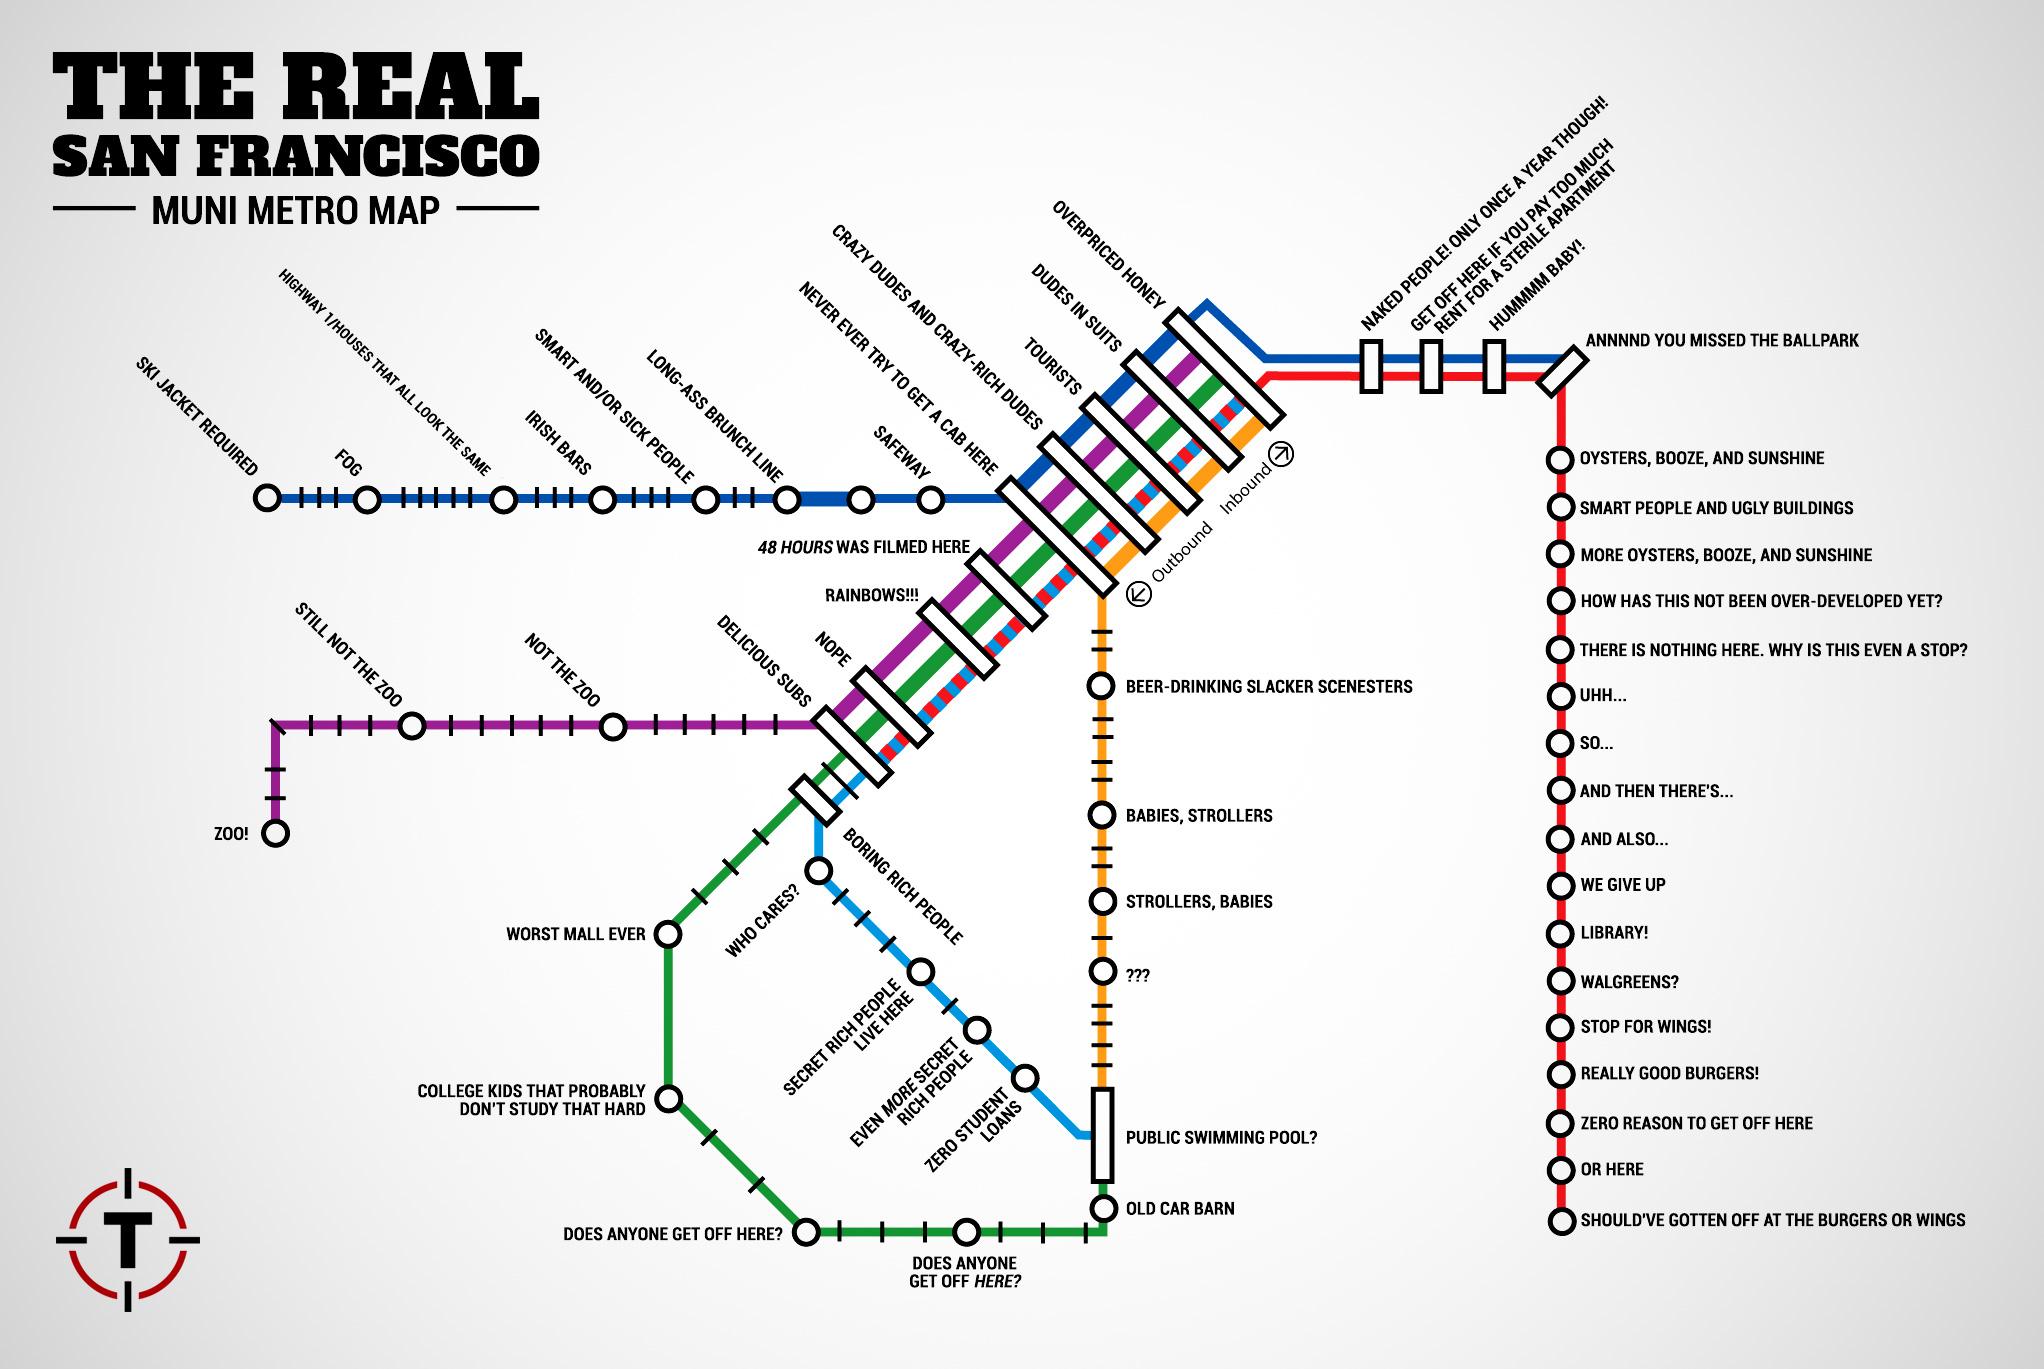 Muni Map Sf SF Muni Metro Map   Thrillist Muni Map Sf